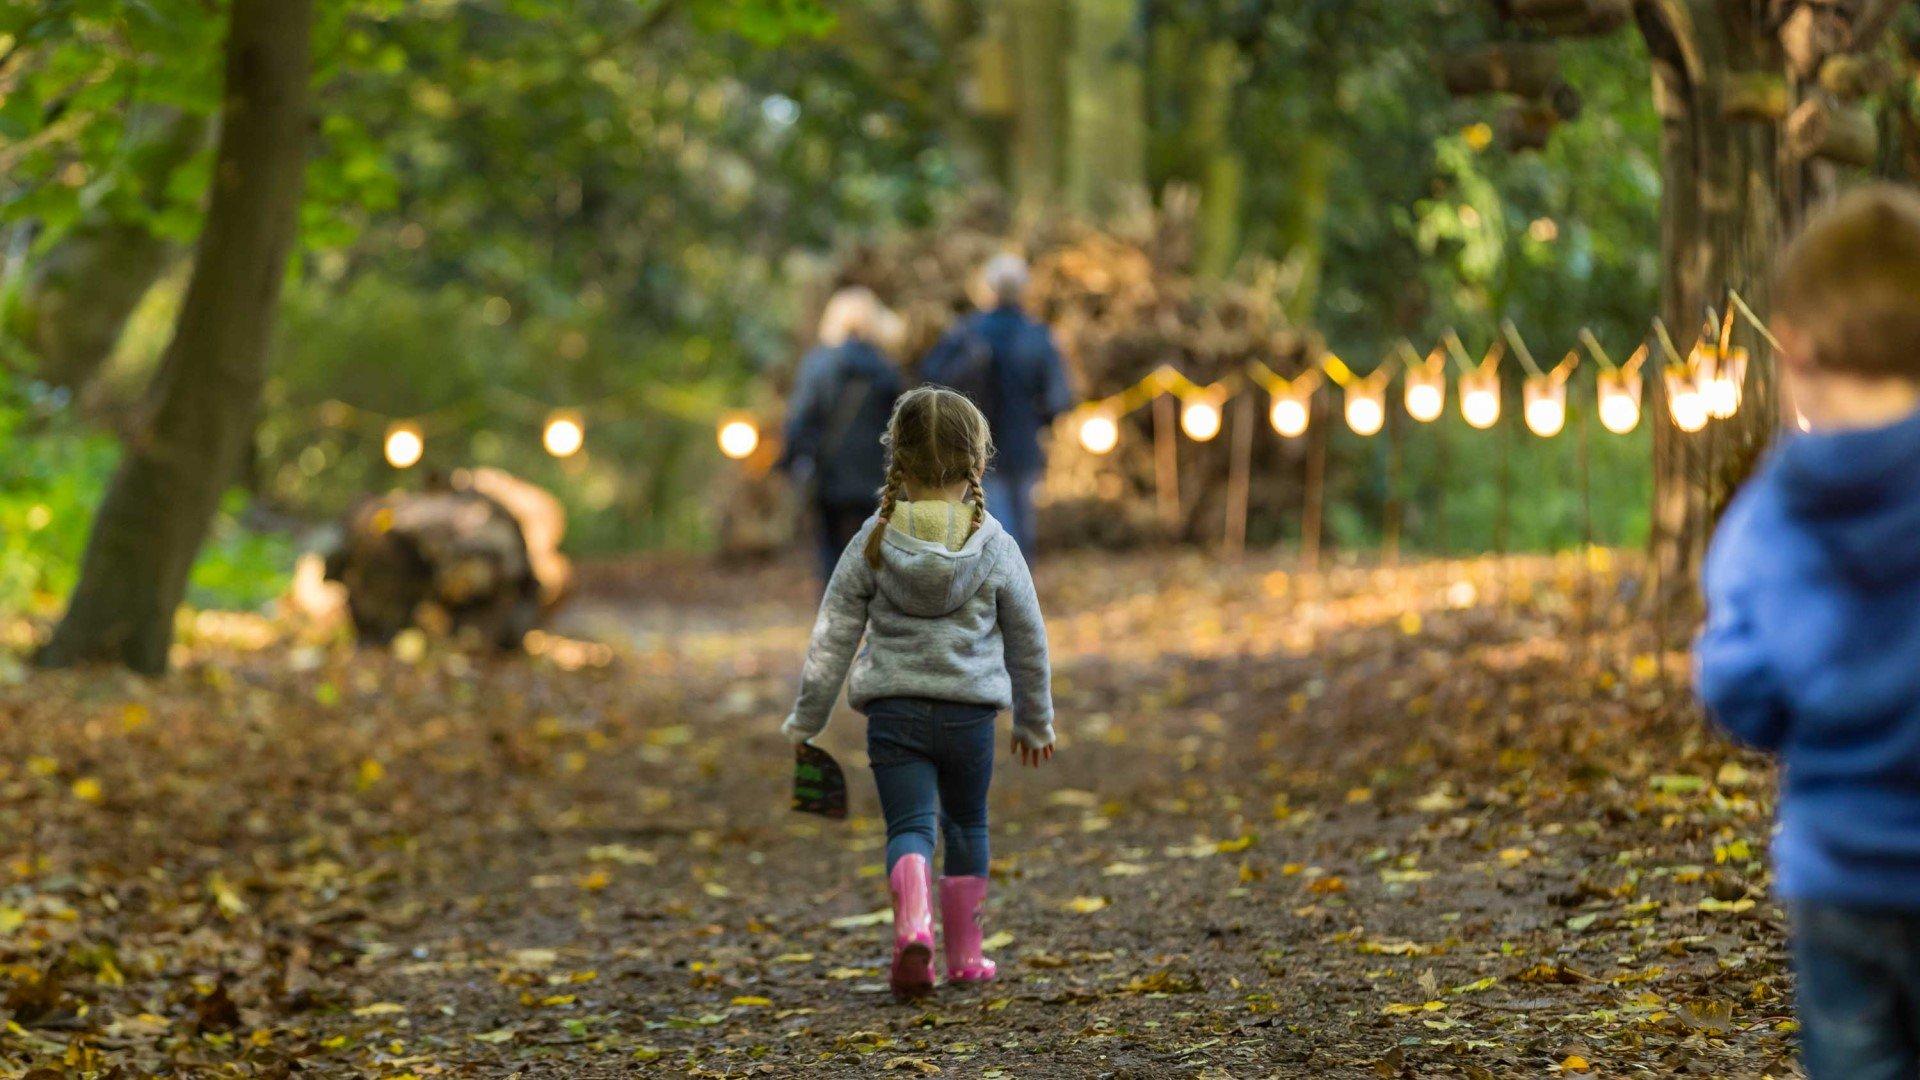 Halloween Trail at Waddesdon Manor - Miss Alices Walk